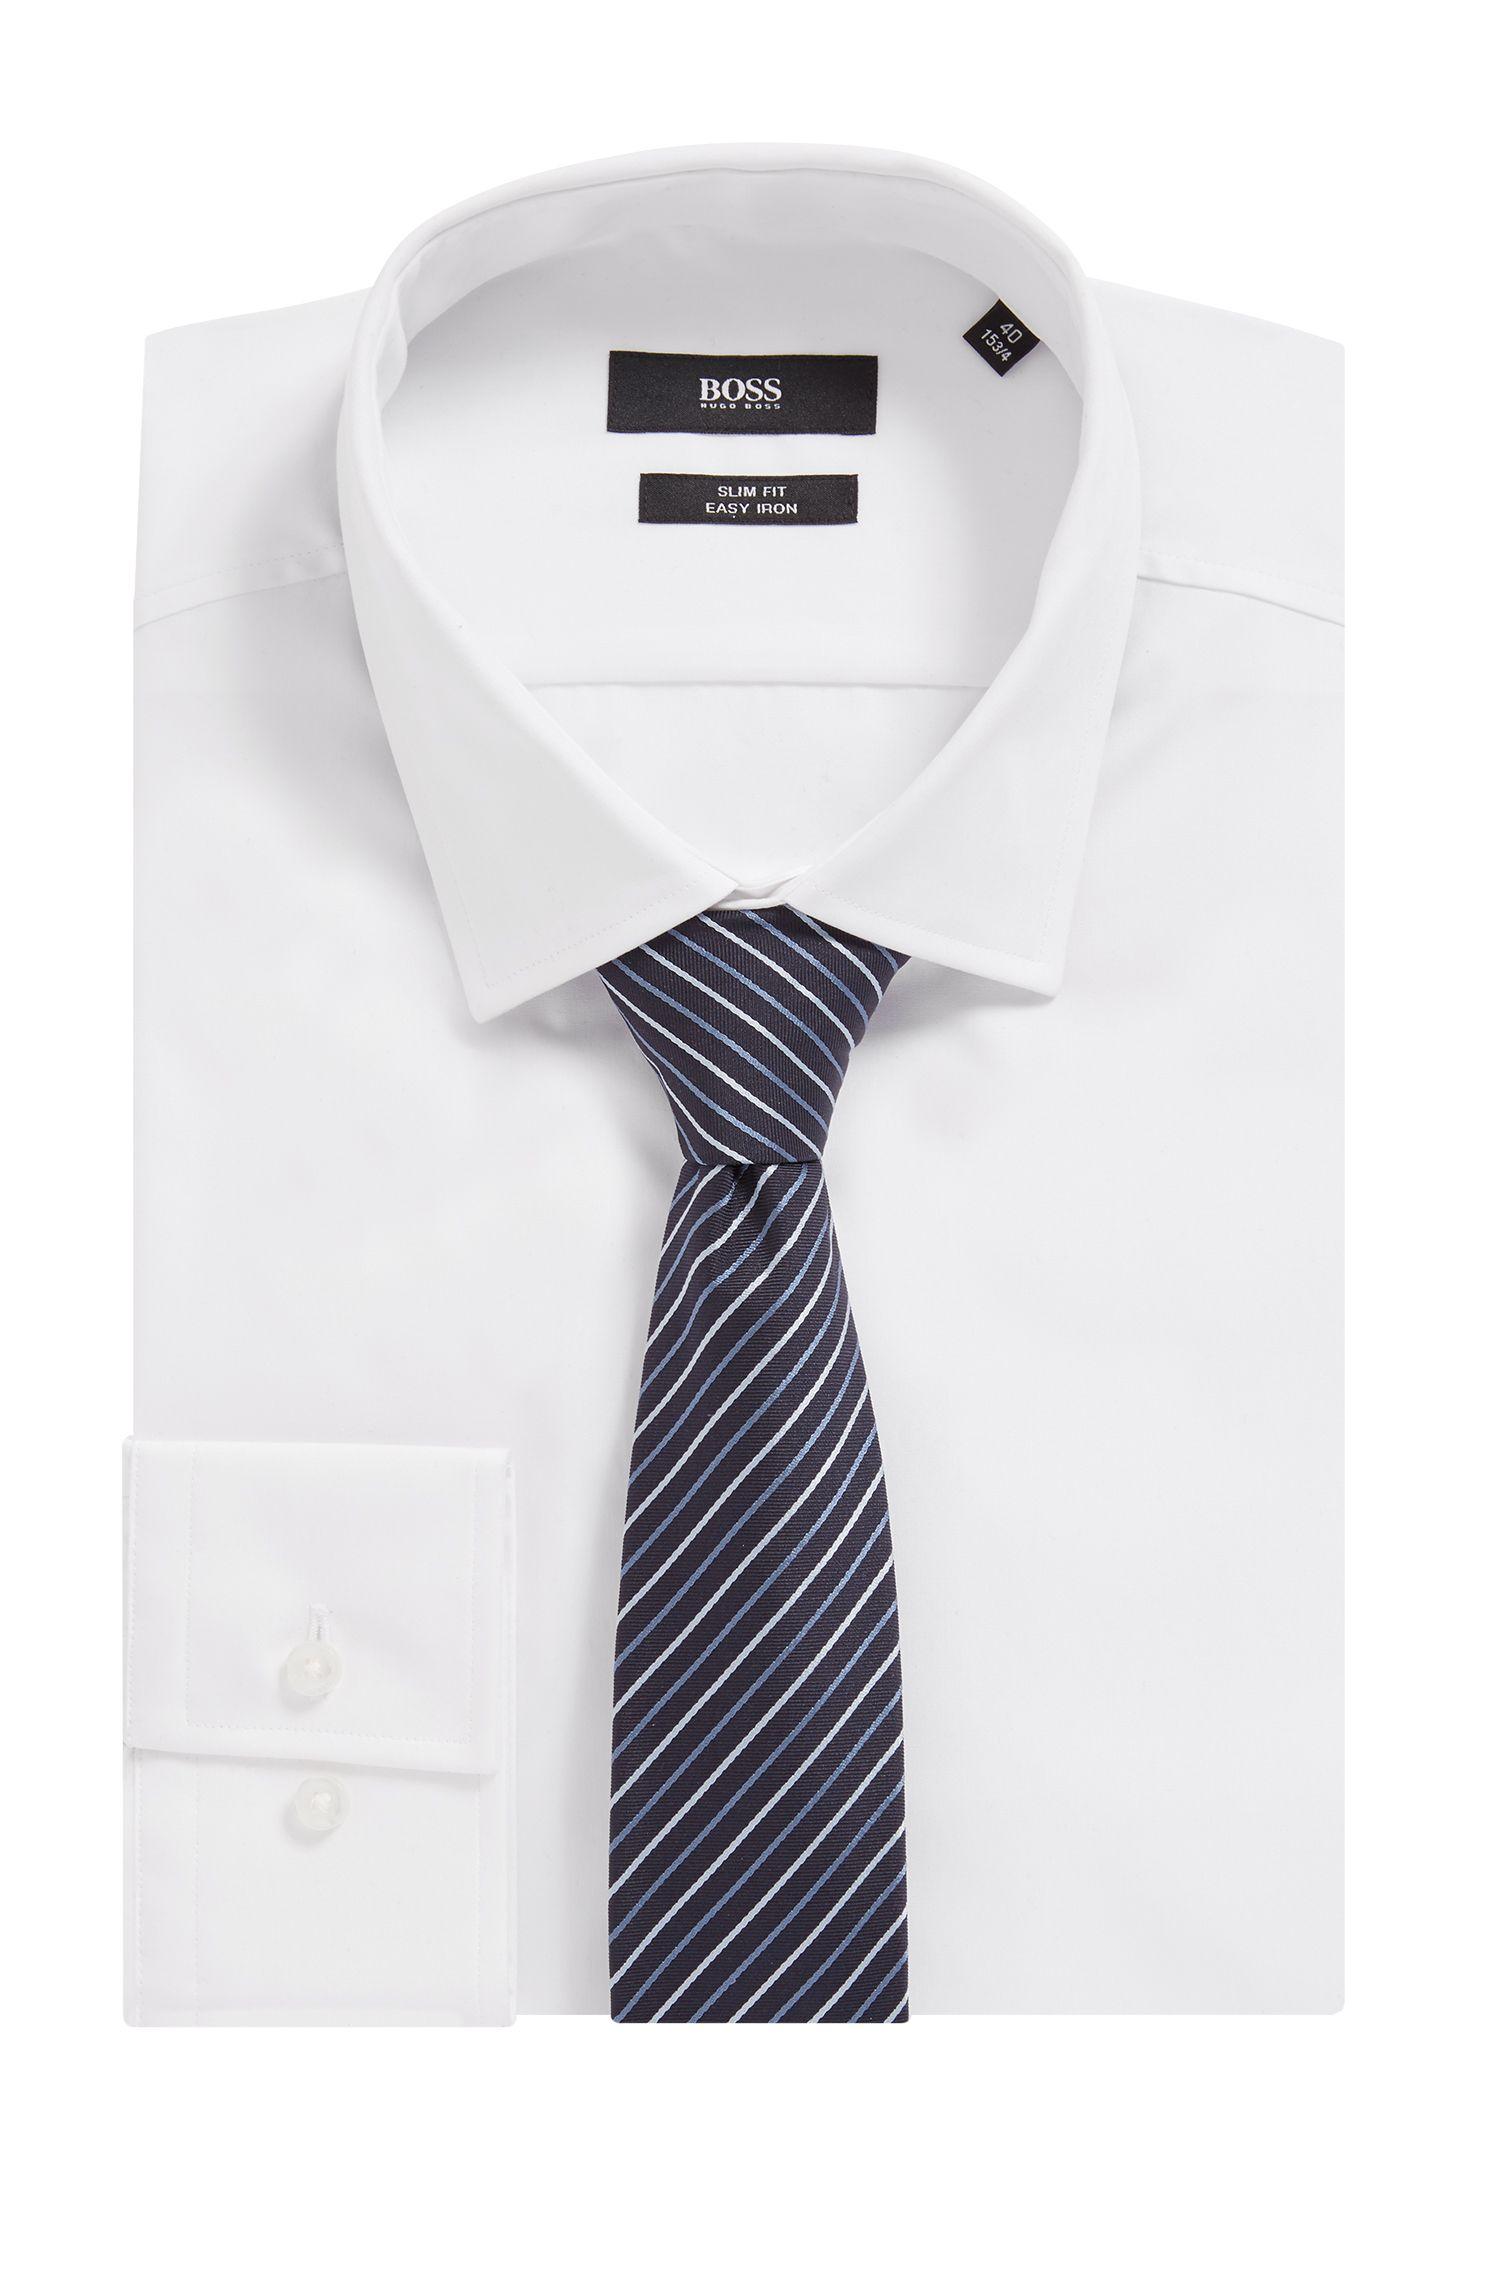 Diagonal striped tie in silk jacquard, Patterned